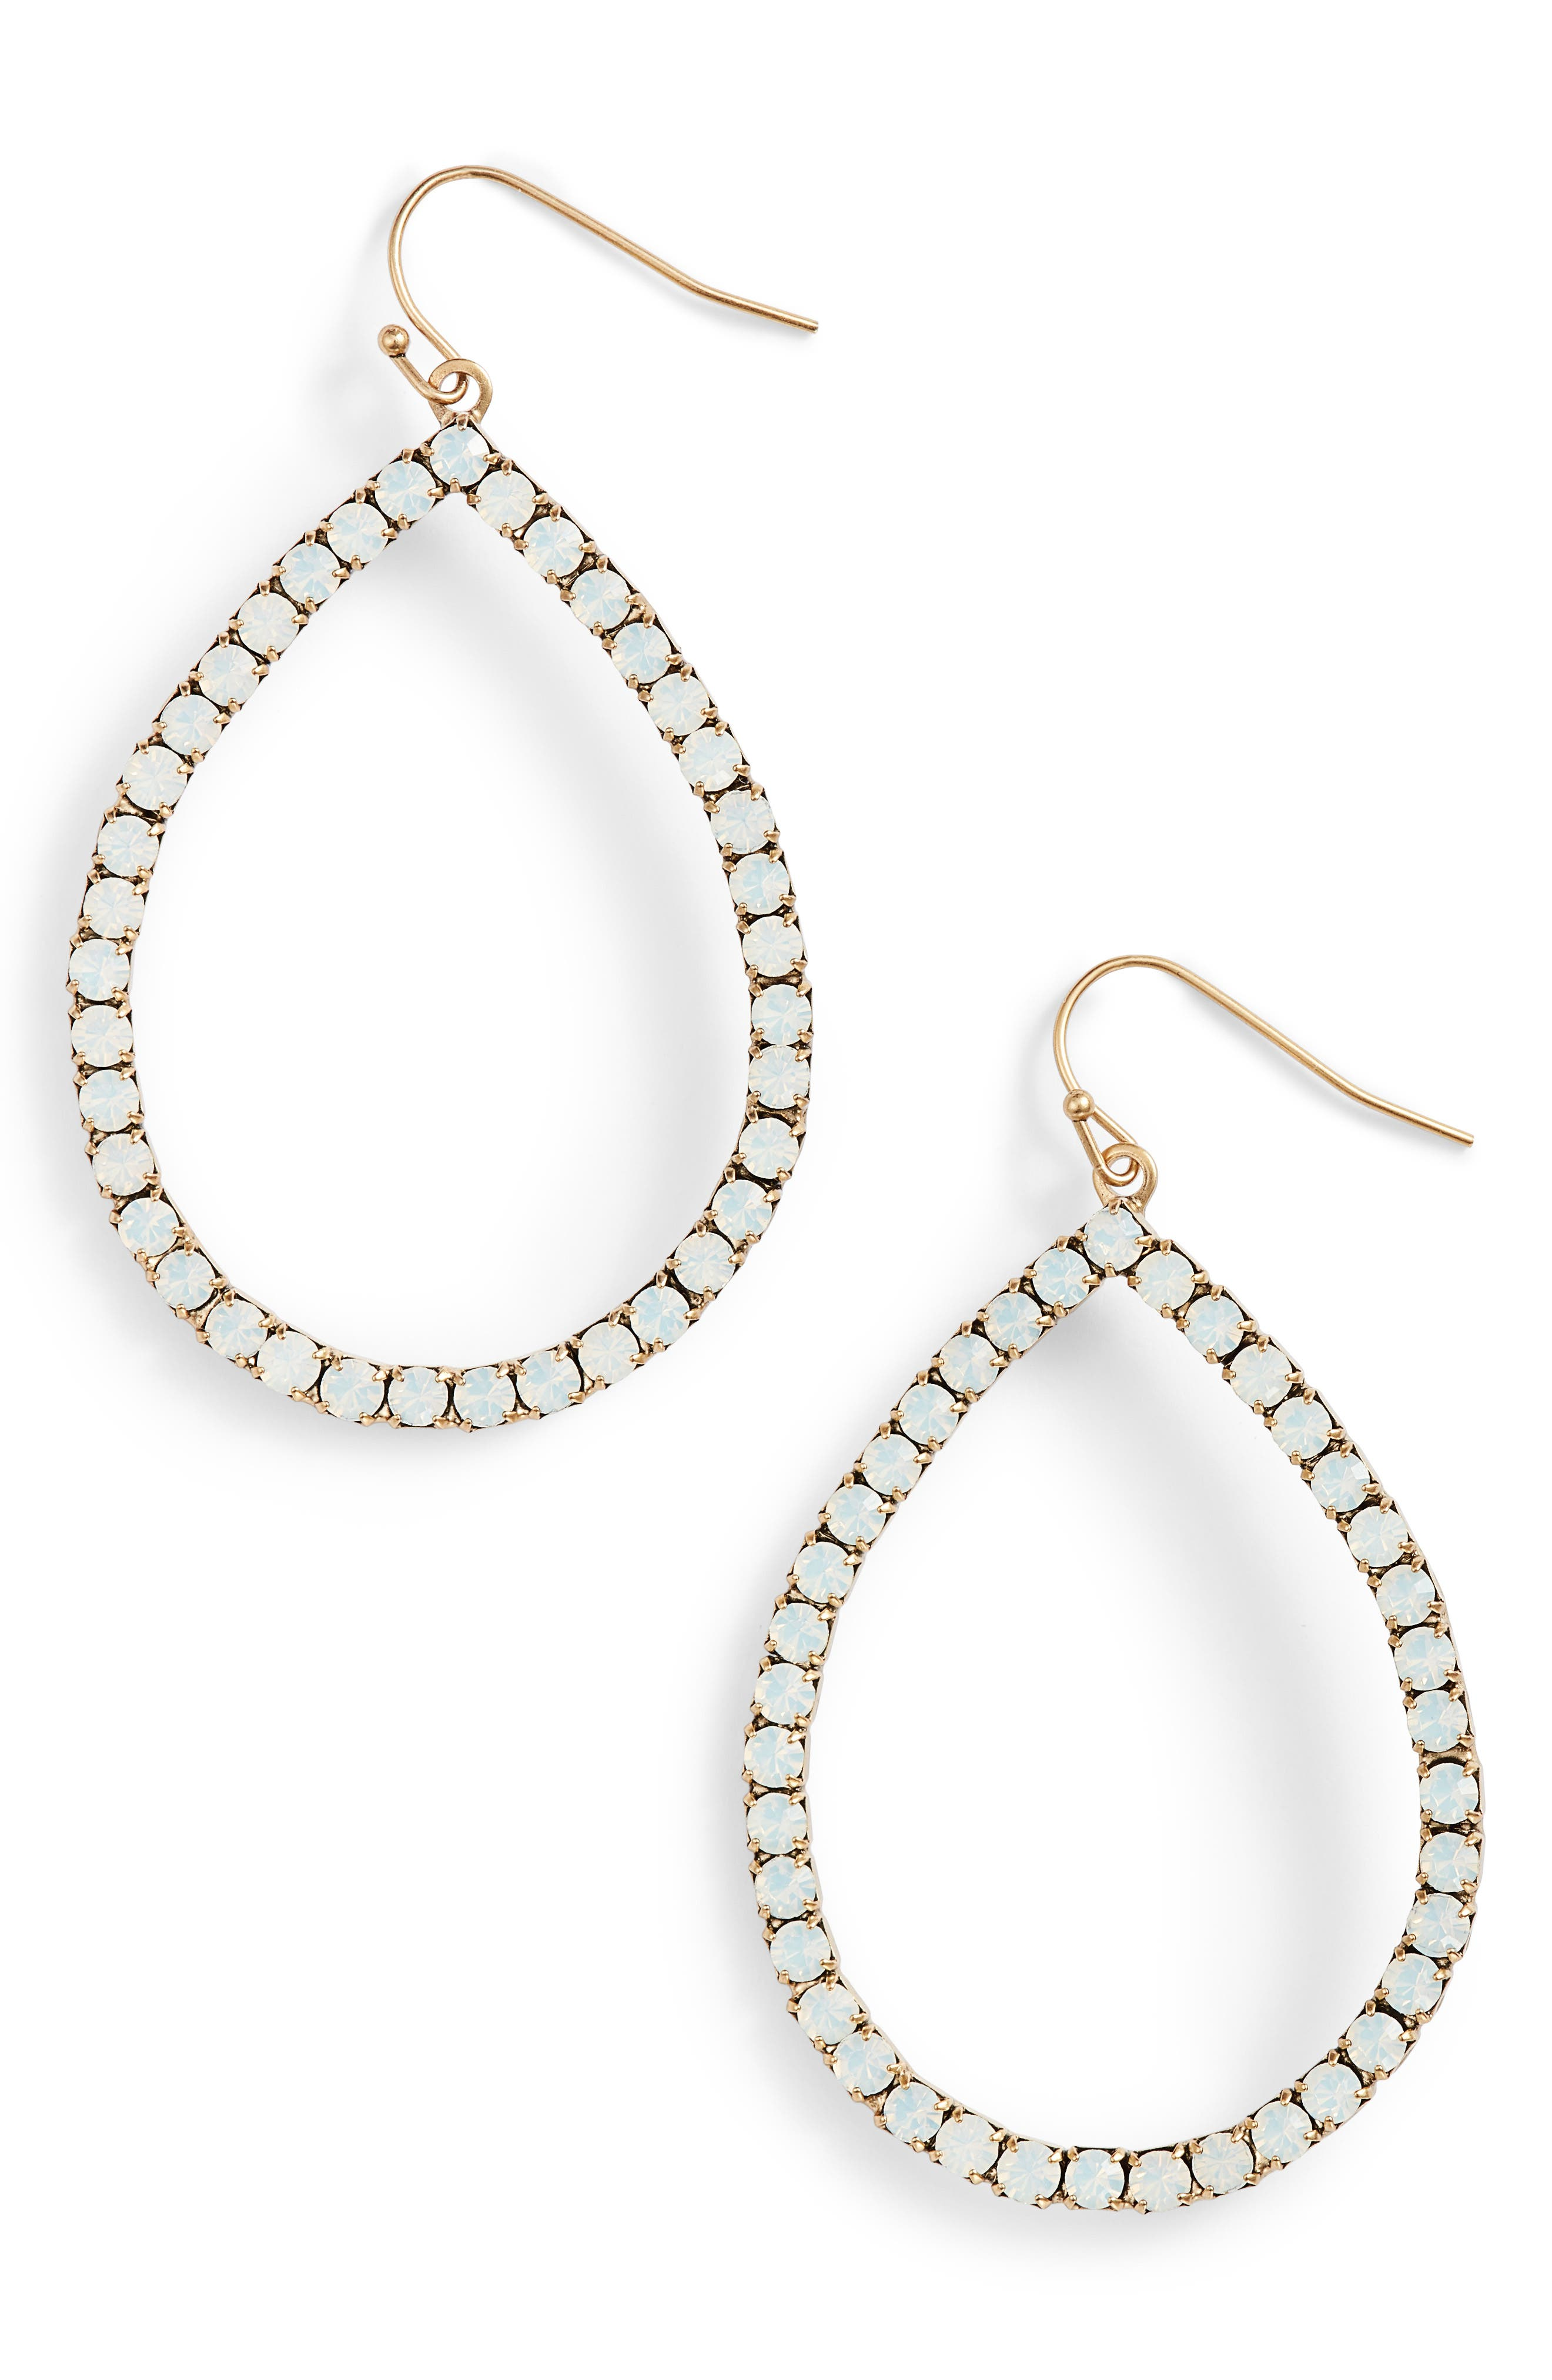 Emilia Crystal Teardrop Earrings,                         Main,                         color, 100